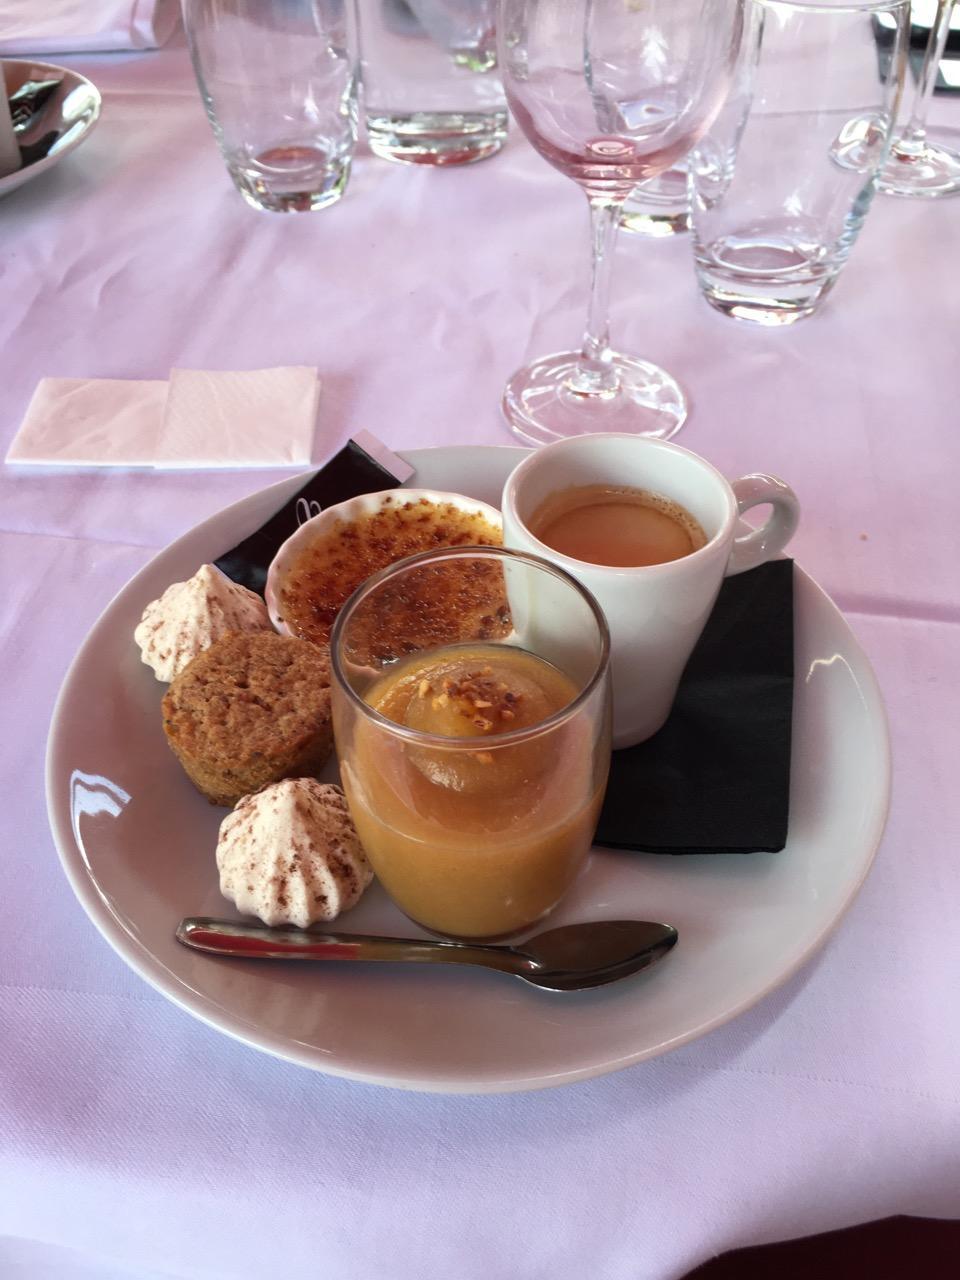 cholet brasserie le grand cafe on cafe gourmand jul20